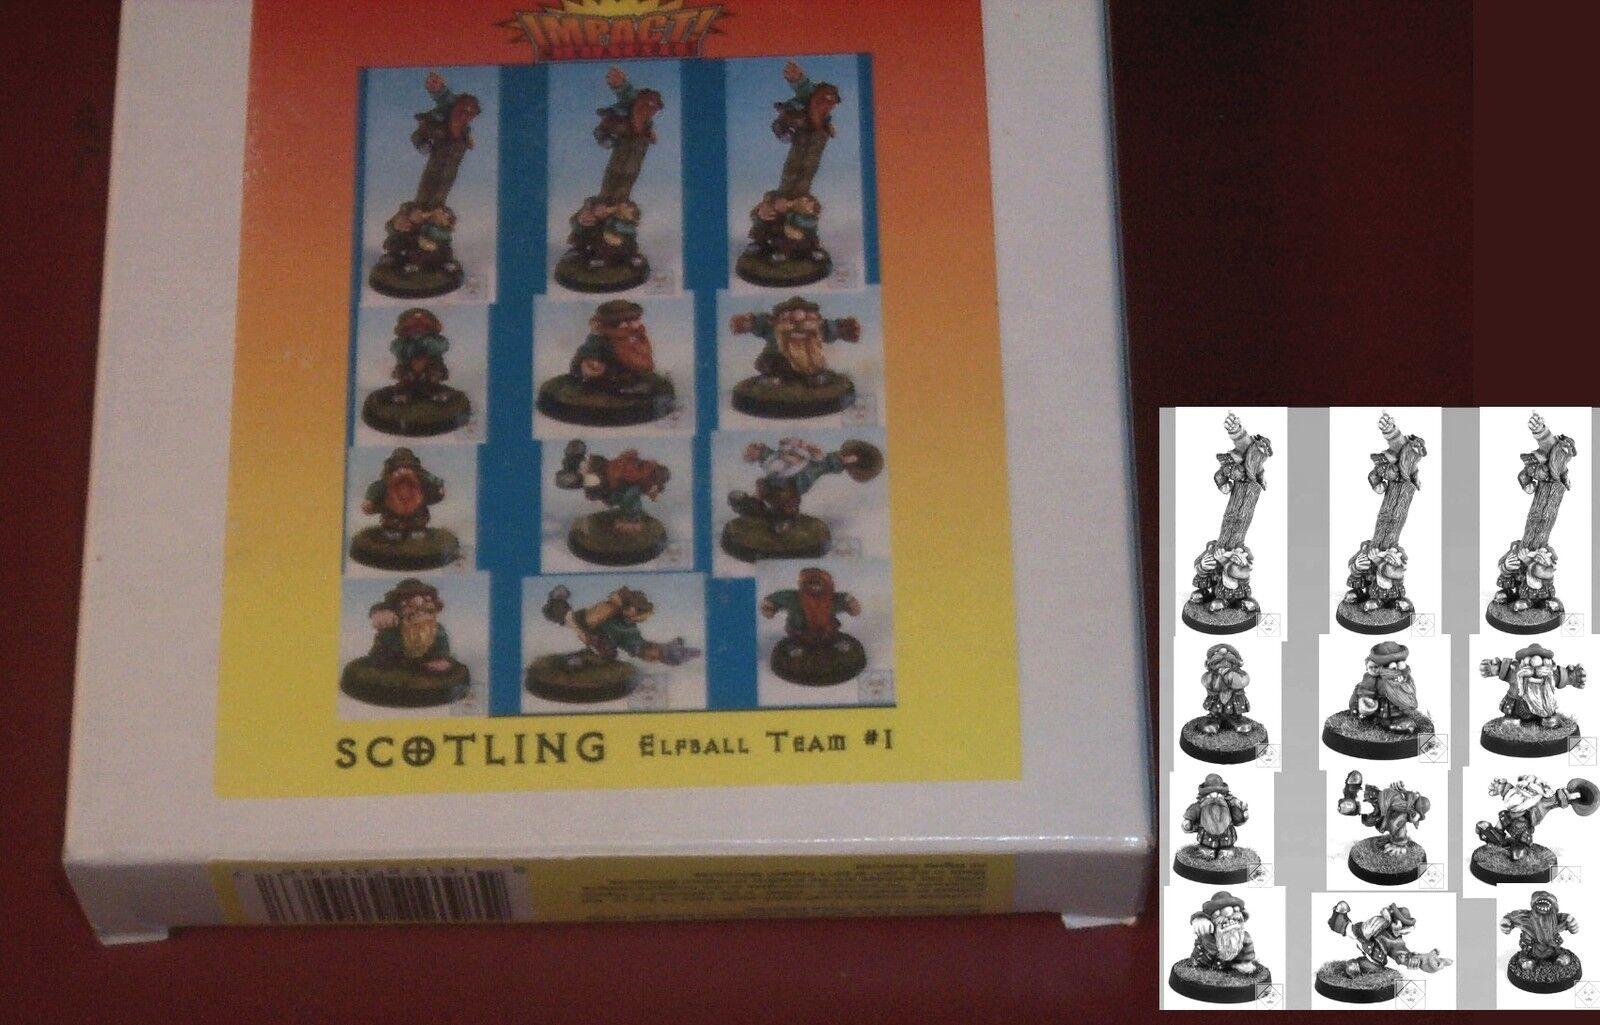 Impact ST-ETM1 Scotling Elfball Team (12) Miniatures Dwarf Football Players